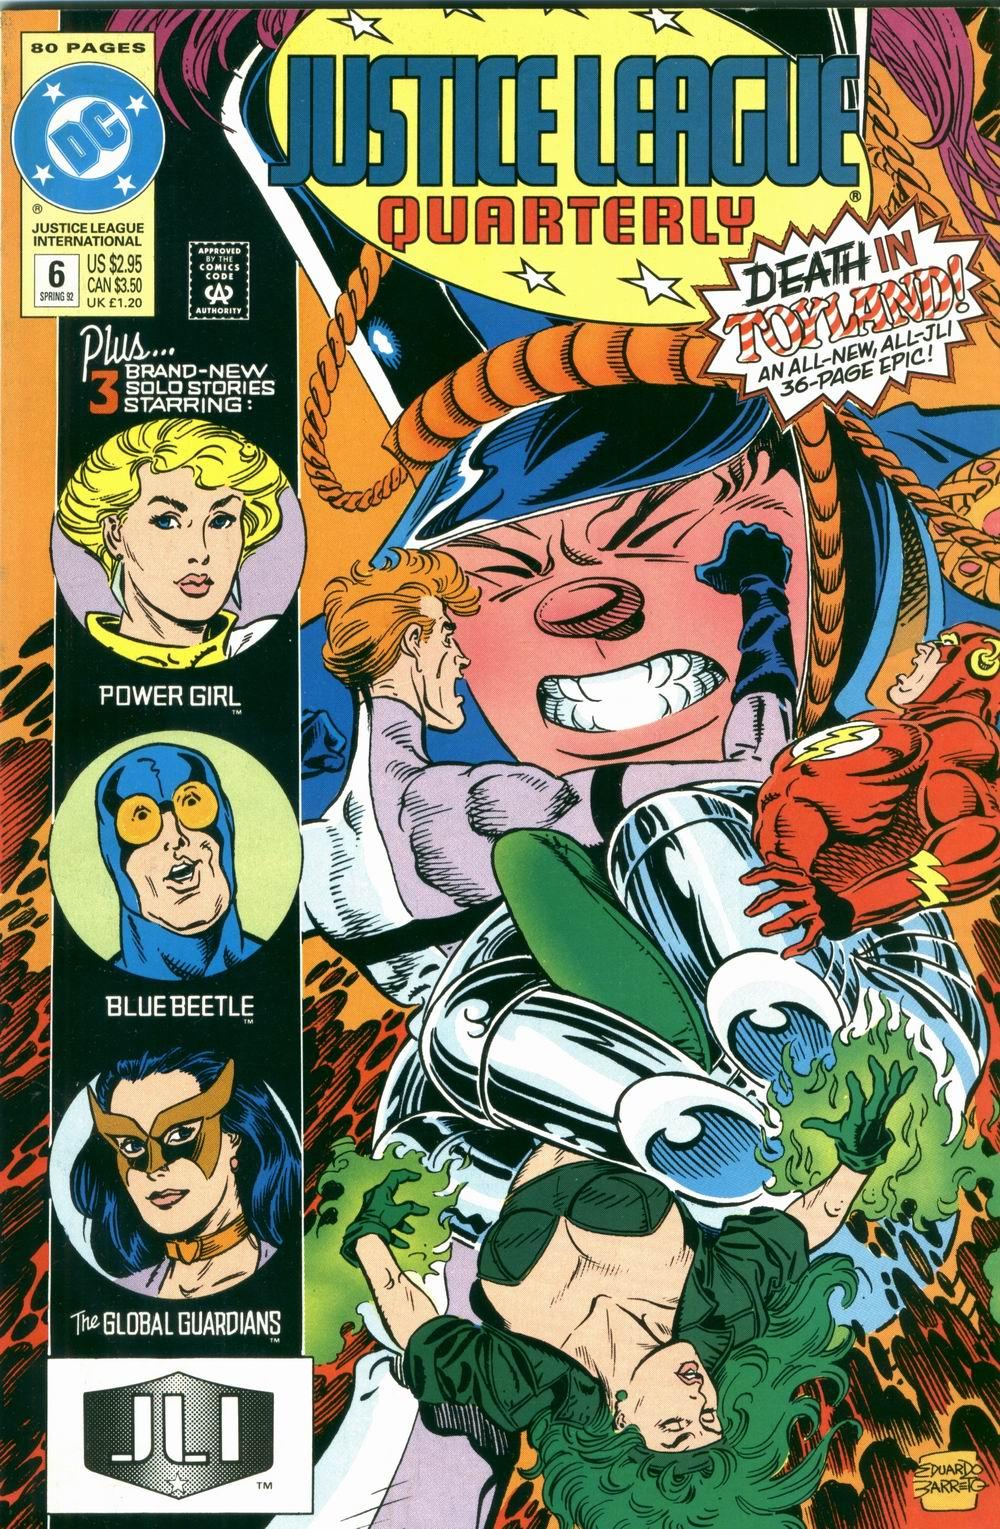 Justice League Quarterly 6 Page 1